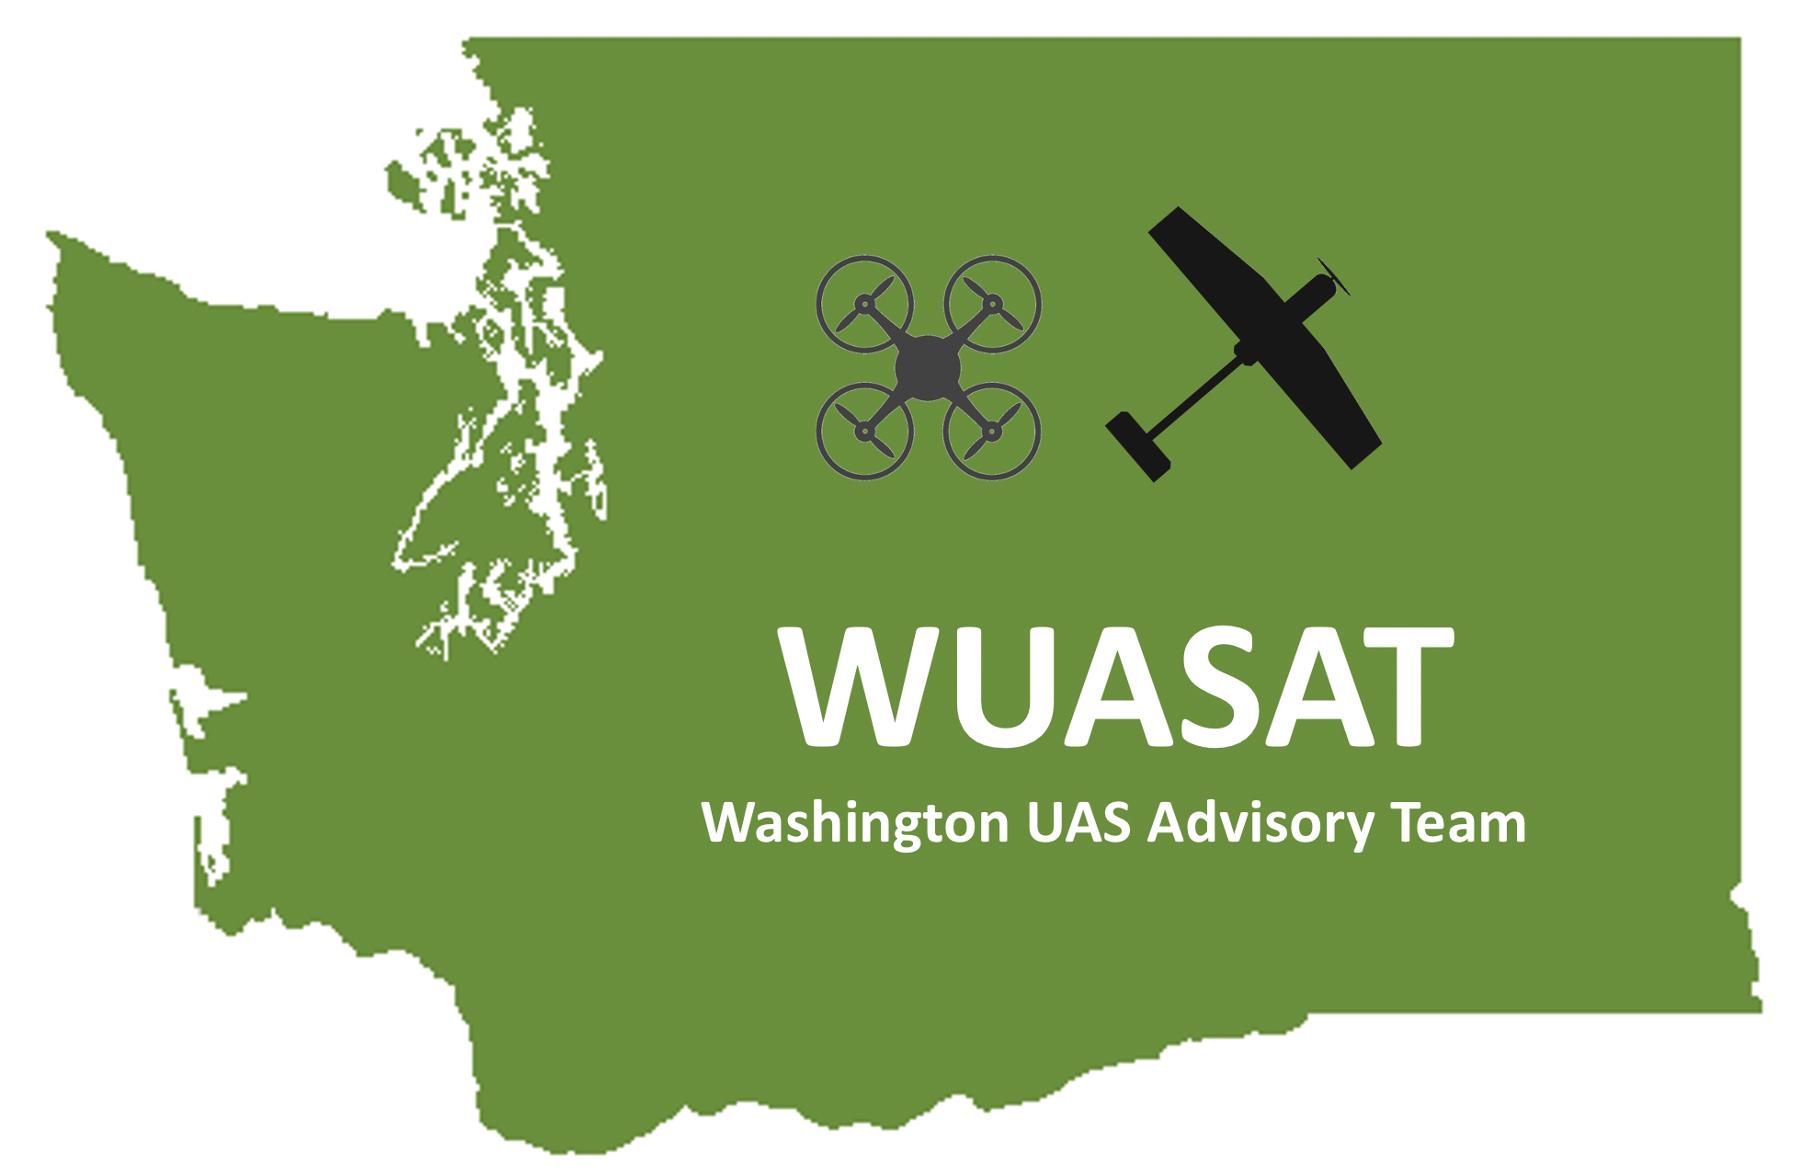 WUASAT logo